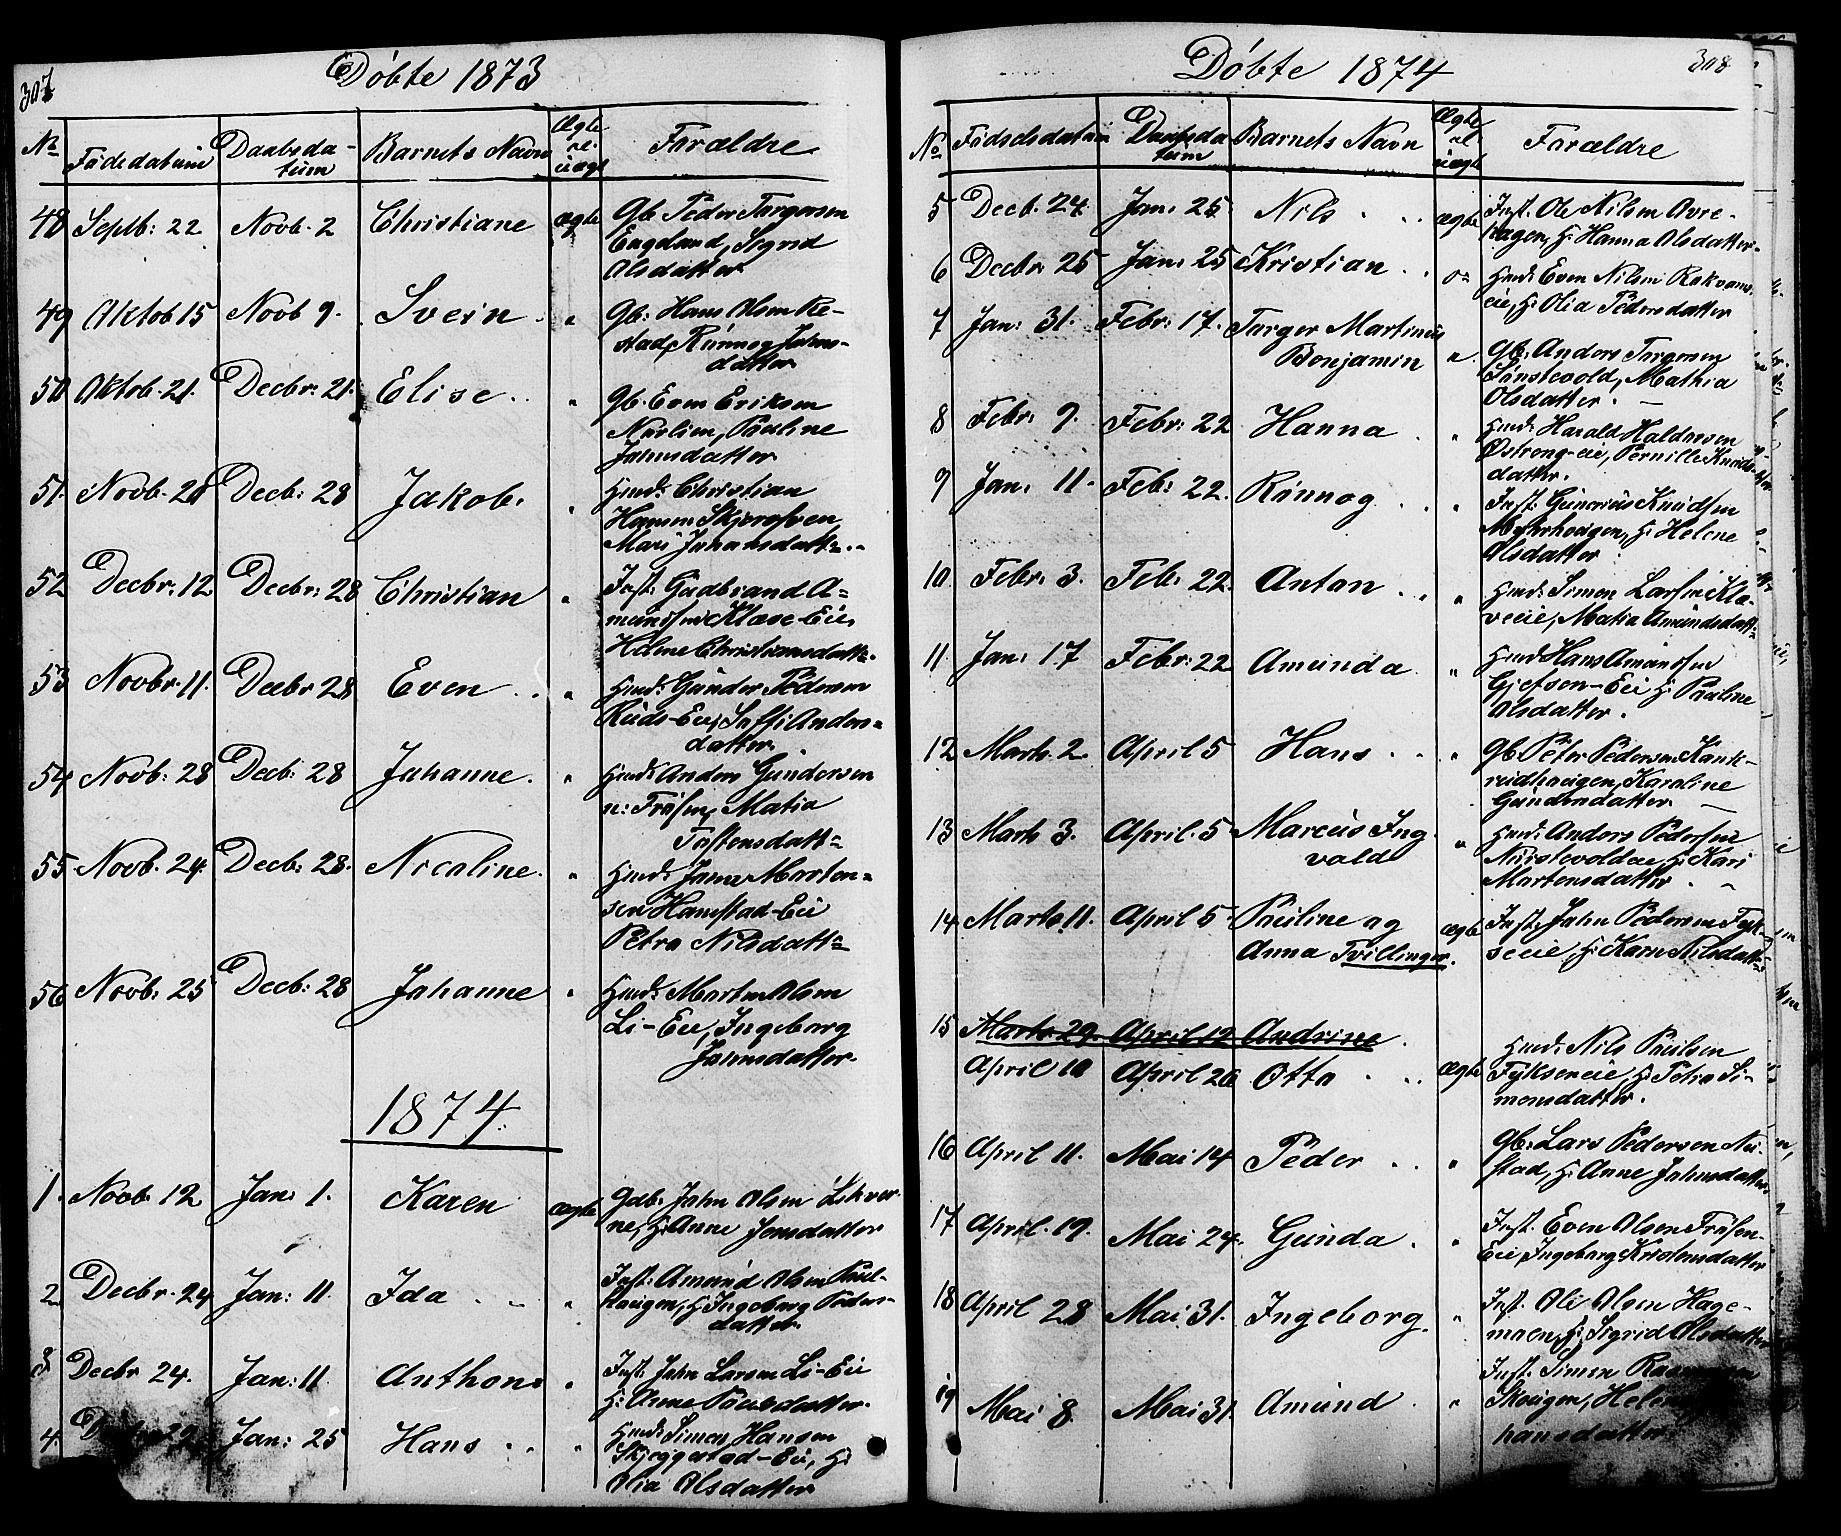 SAH, Østre Gausdal prestekontor, Klokkerbok nr. 1, 1863-1893, s. 307-308